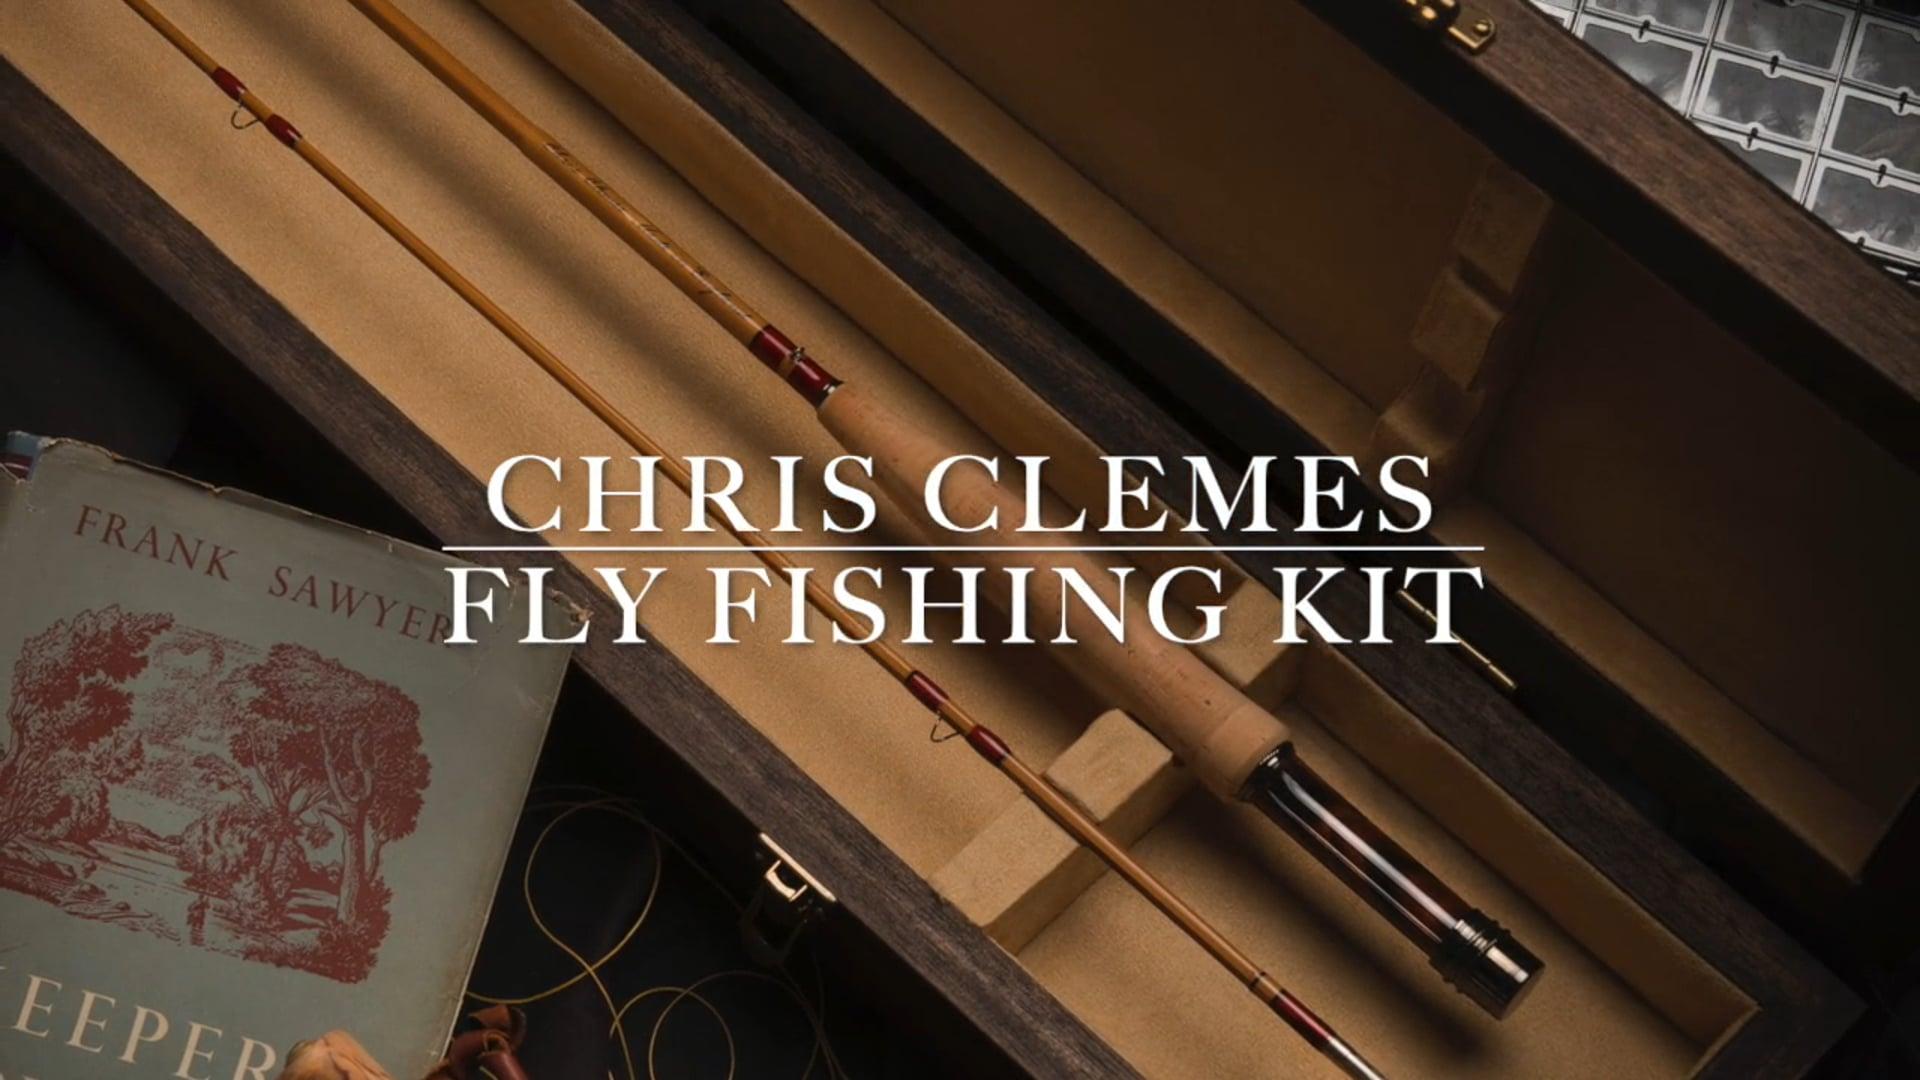 Gentlemans Fly Fishing Kit